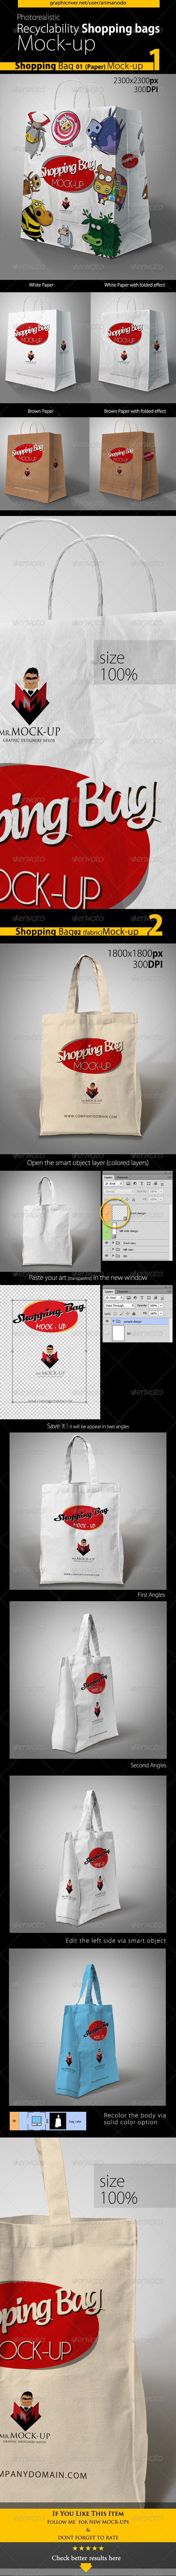 Paper & Cotton Shopping Bag Mockup Download here: https://graphicriver.net/item/paper-cotton-shopping-bag-mockup/5548178?ref=KlitVogli